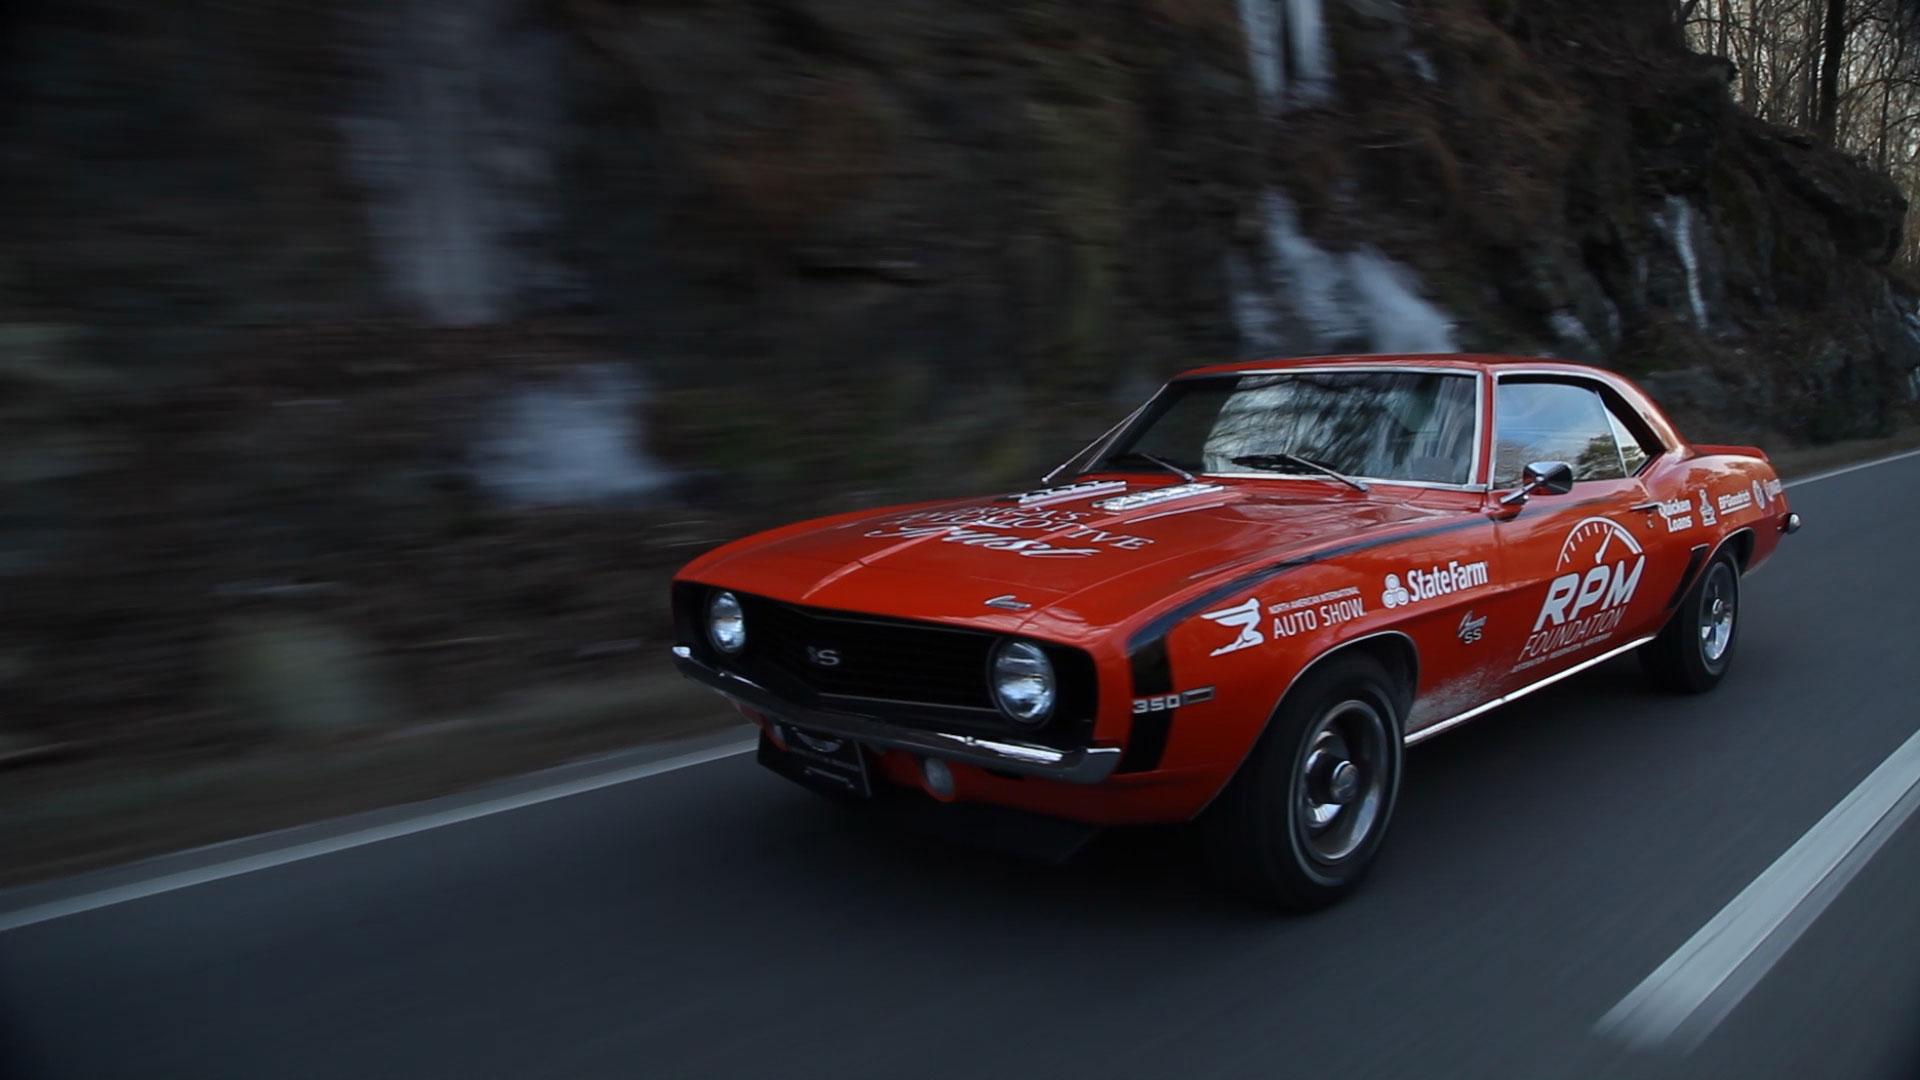 1969 Chevrolet Camaro cruising the Smokey Mountains